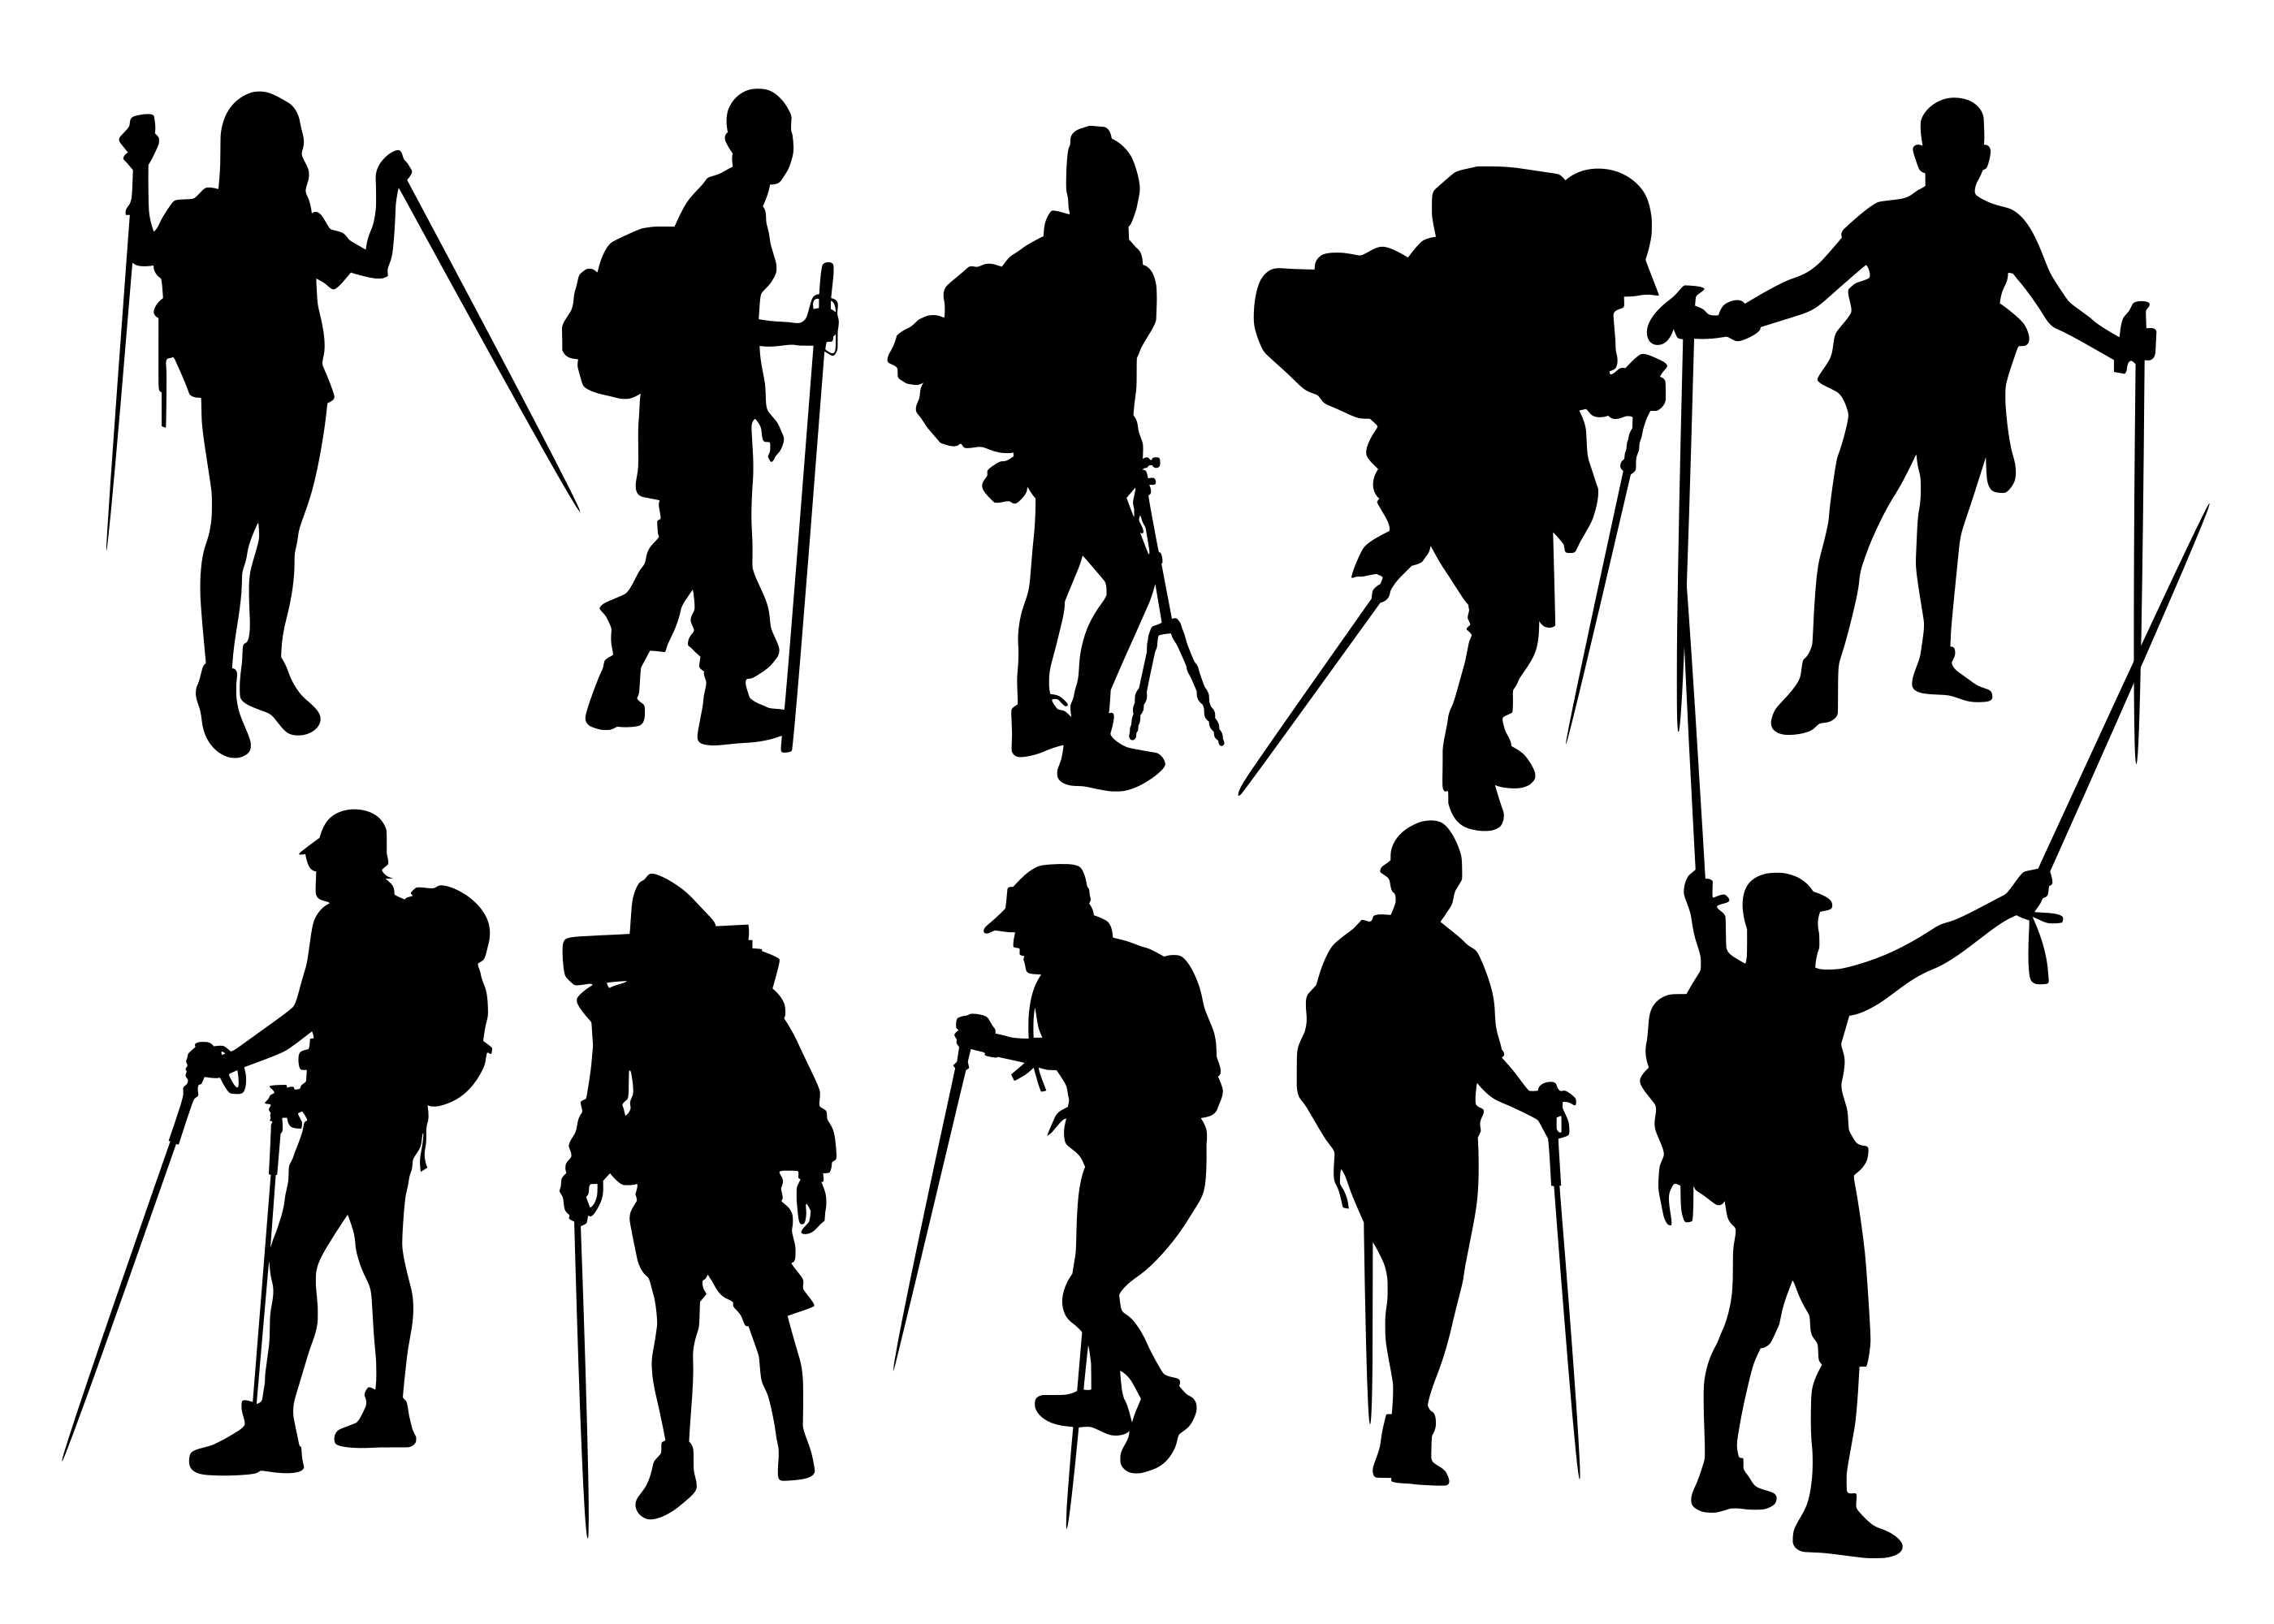 10-hiker-silhouette-cover.jpg